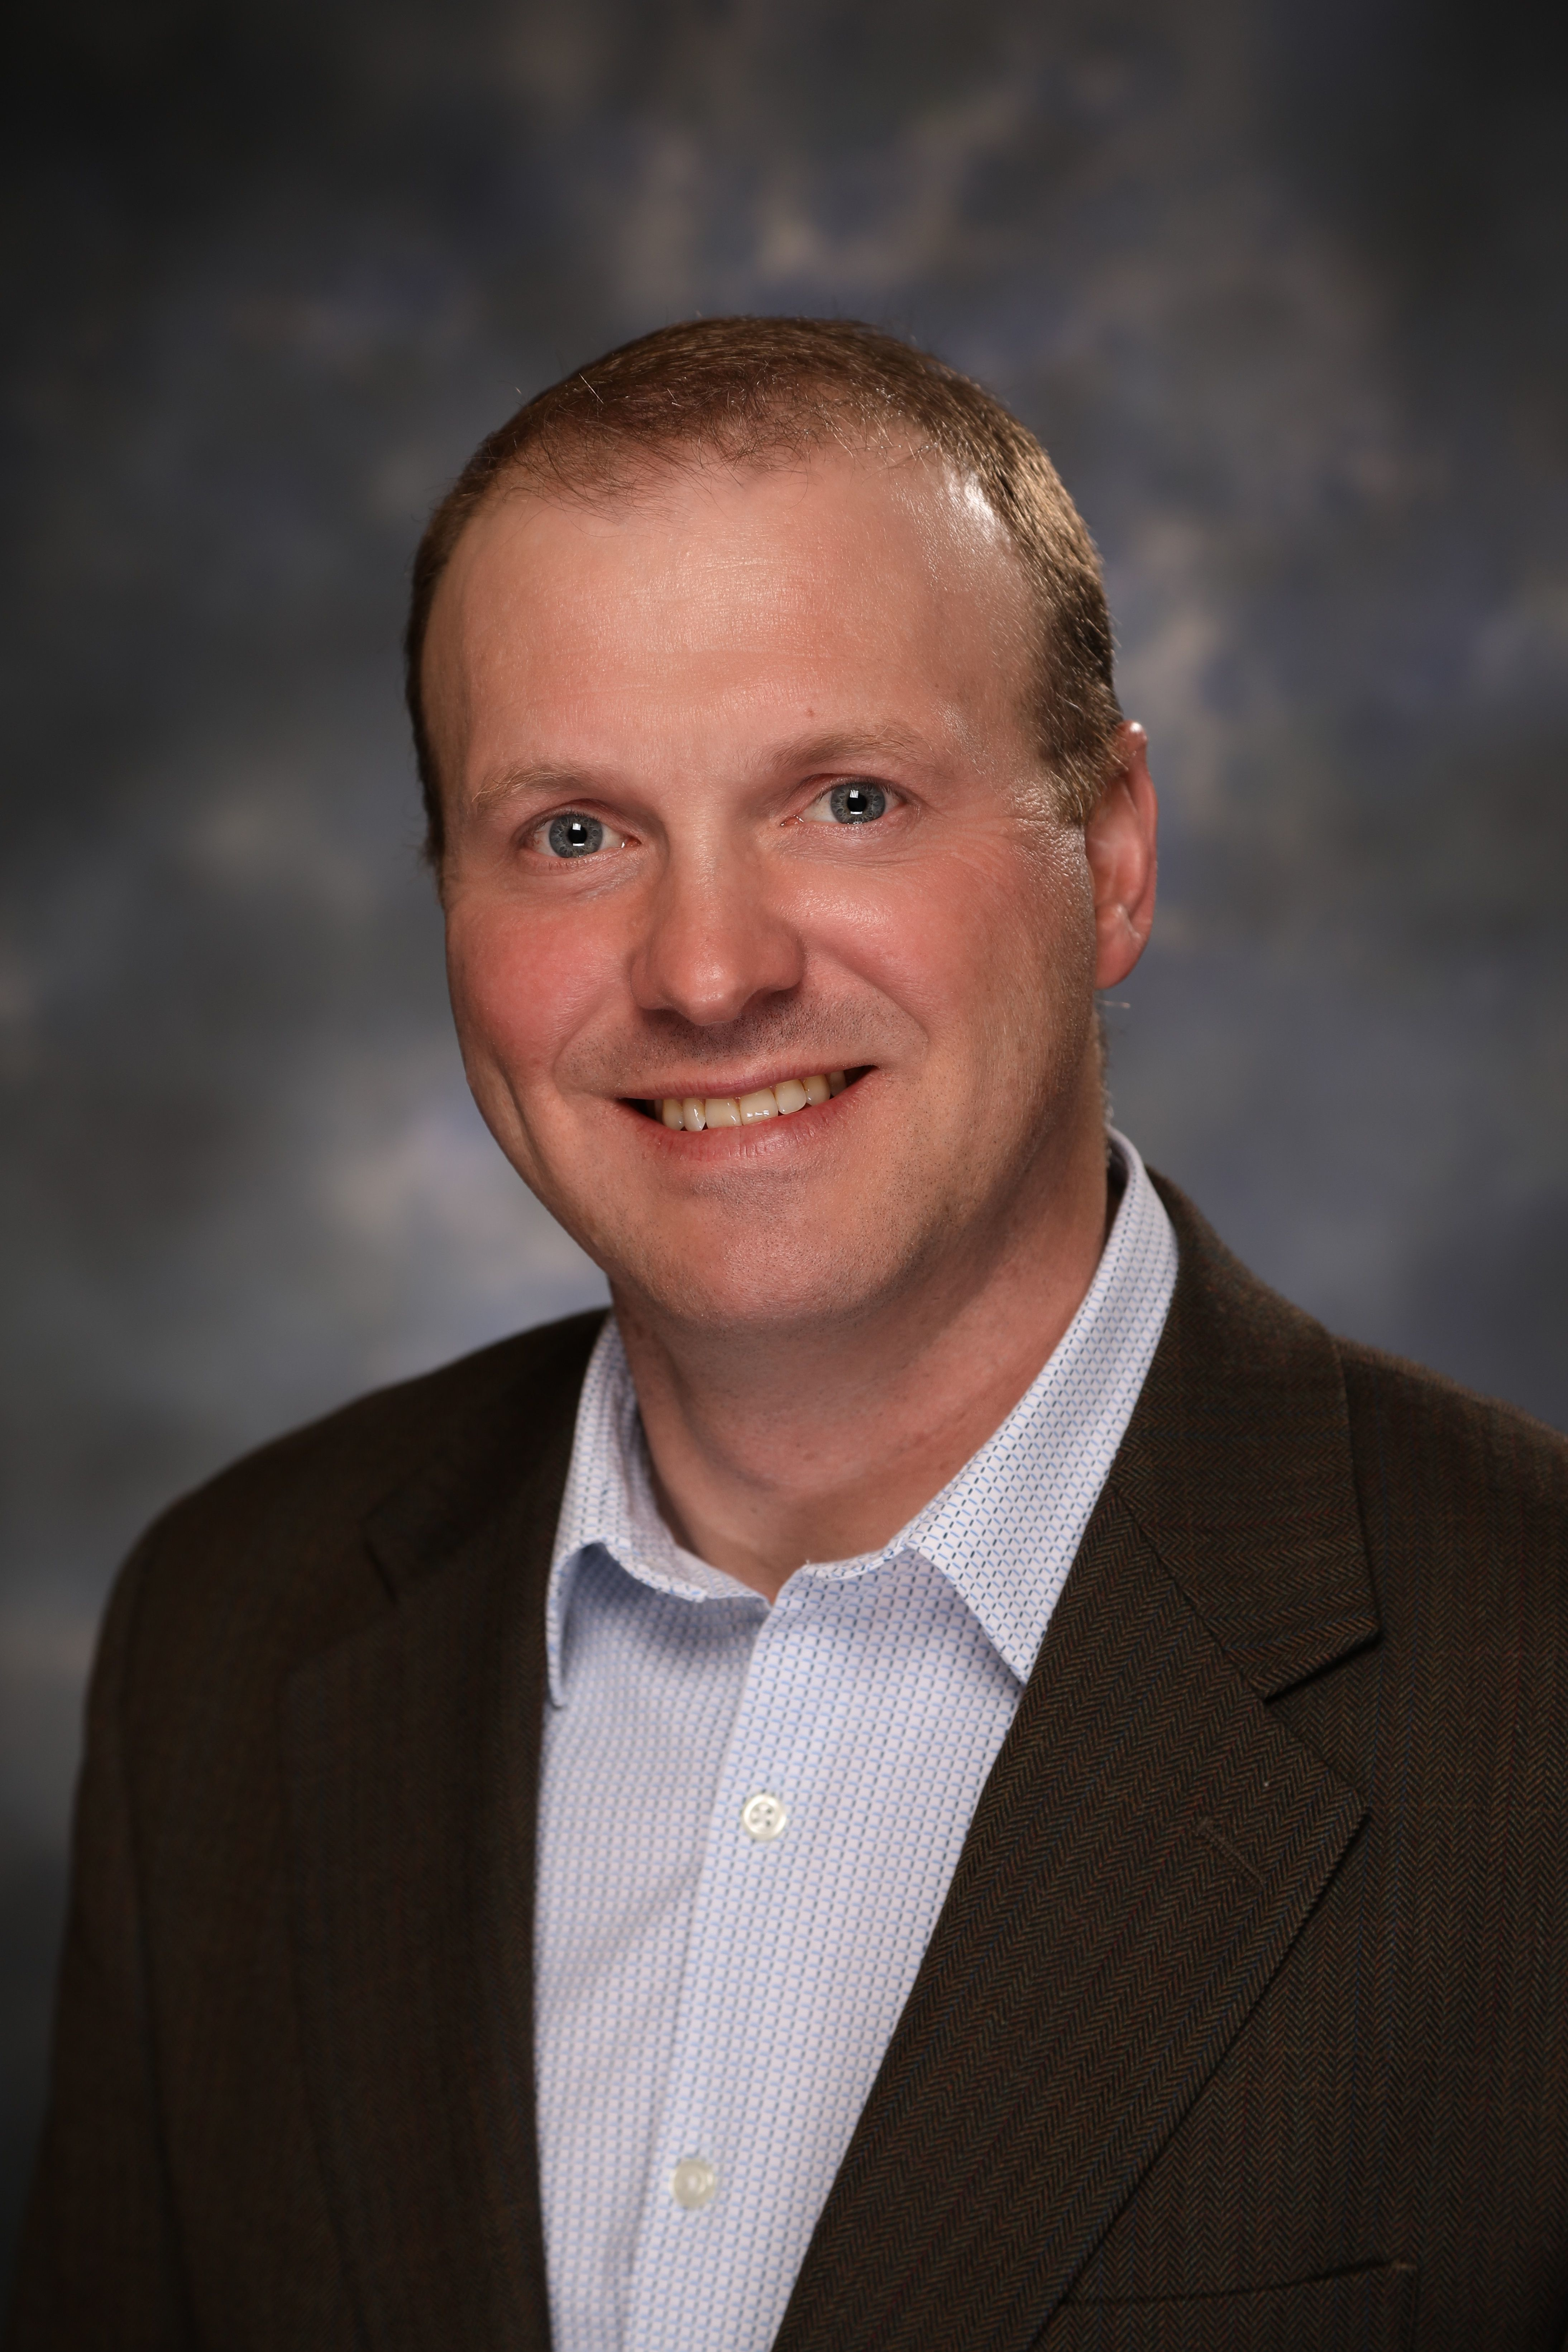 Corey Tompkins - Vice Chair